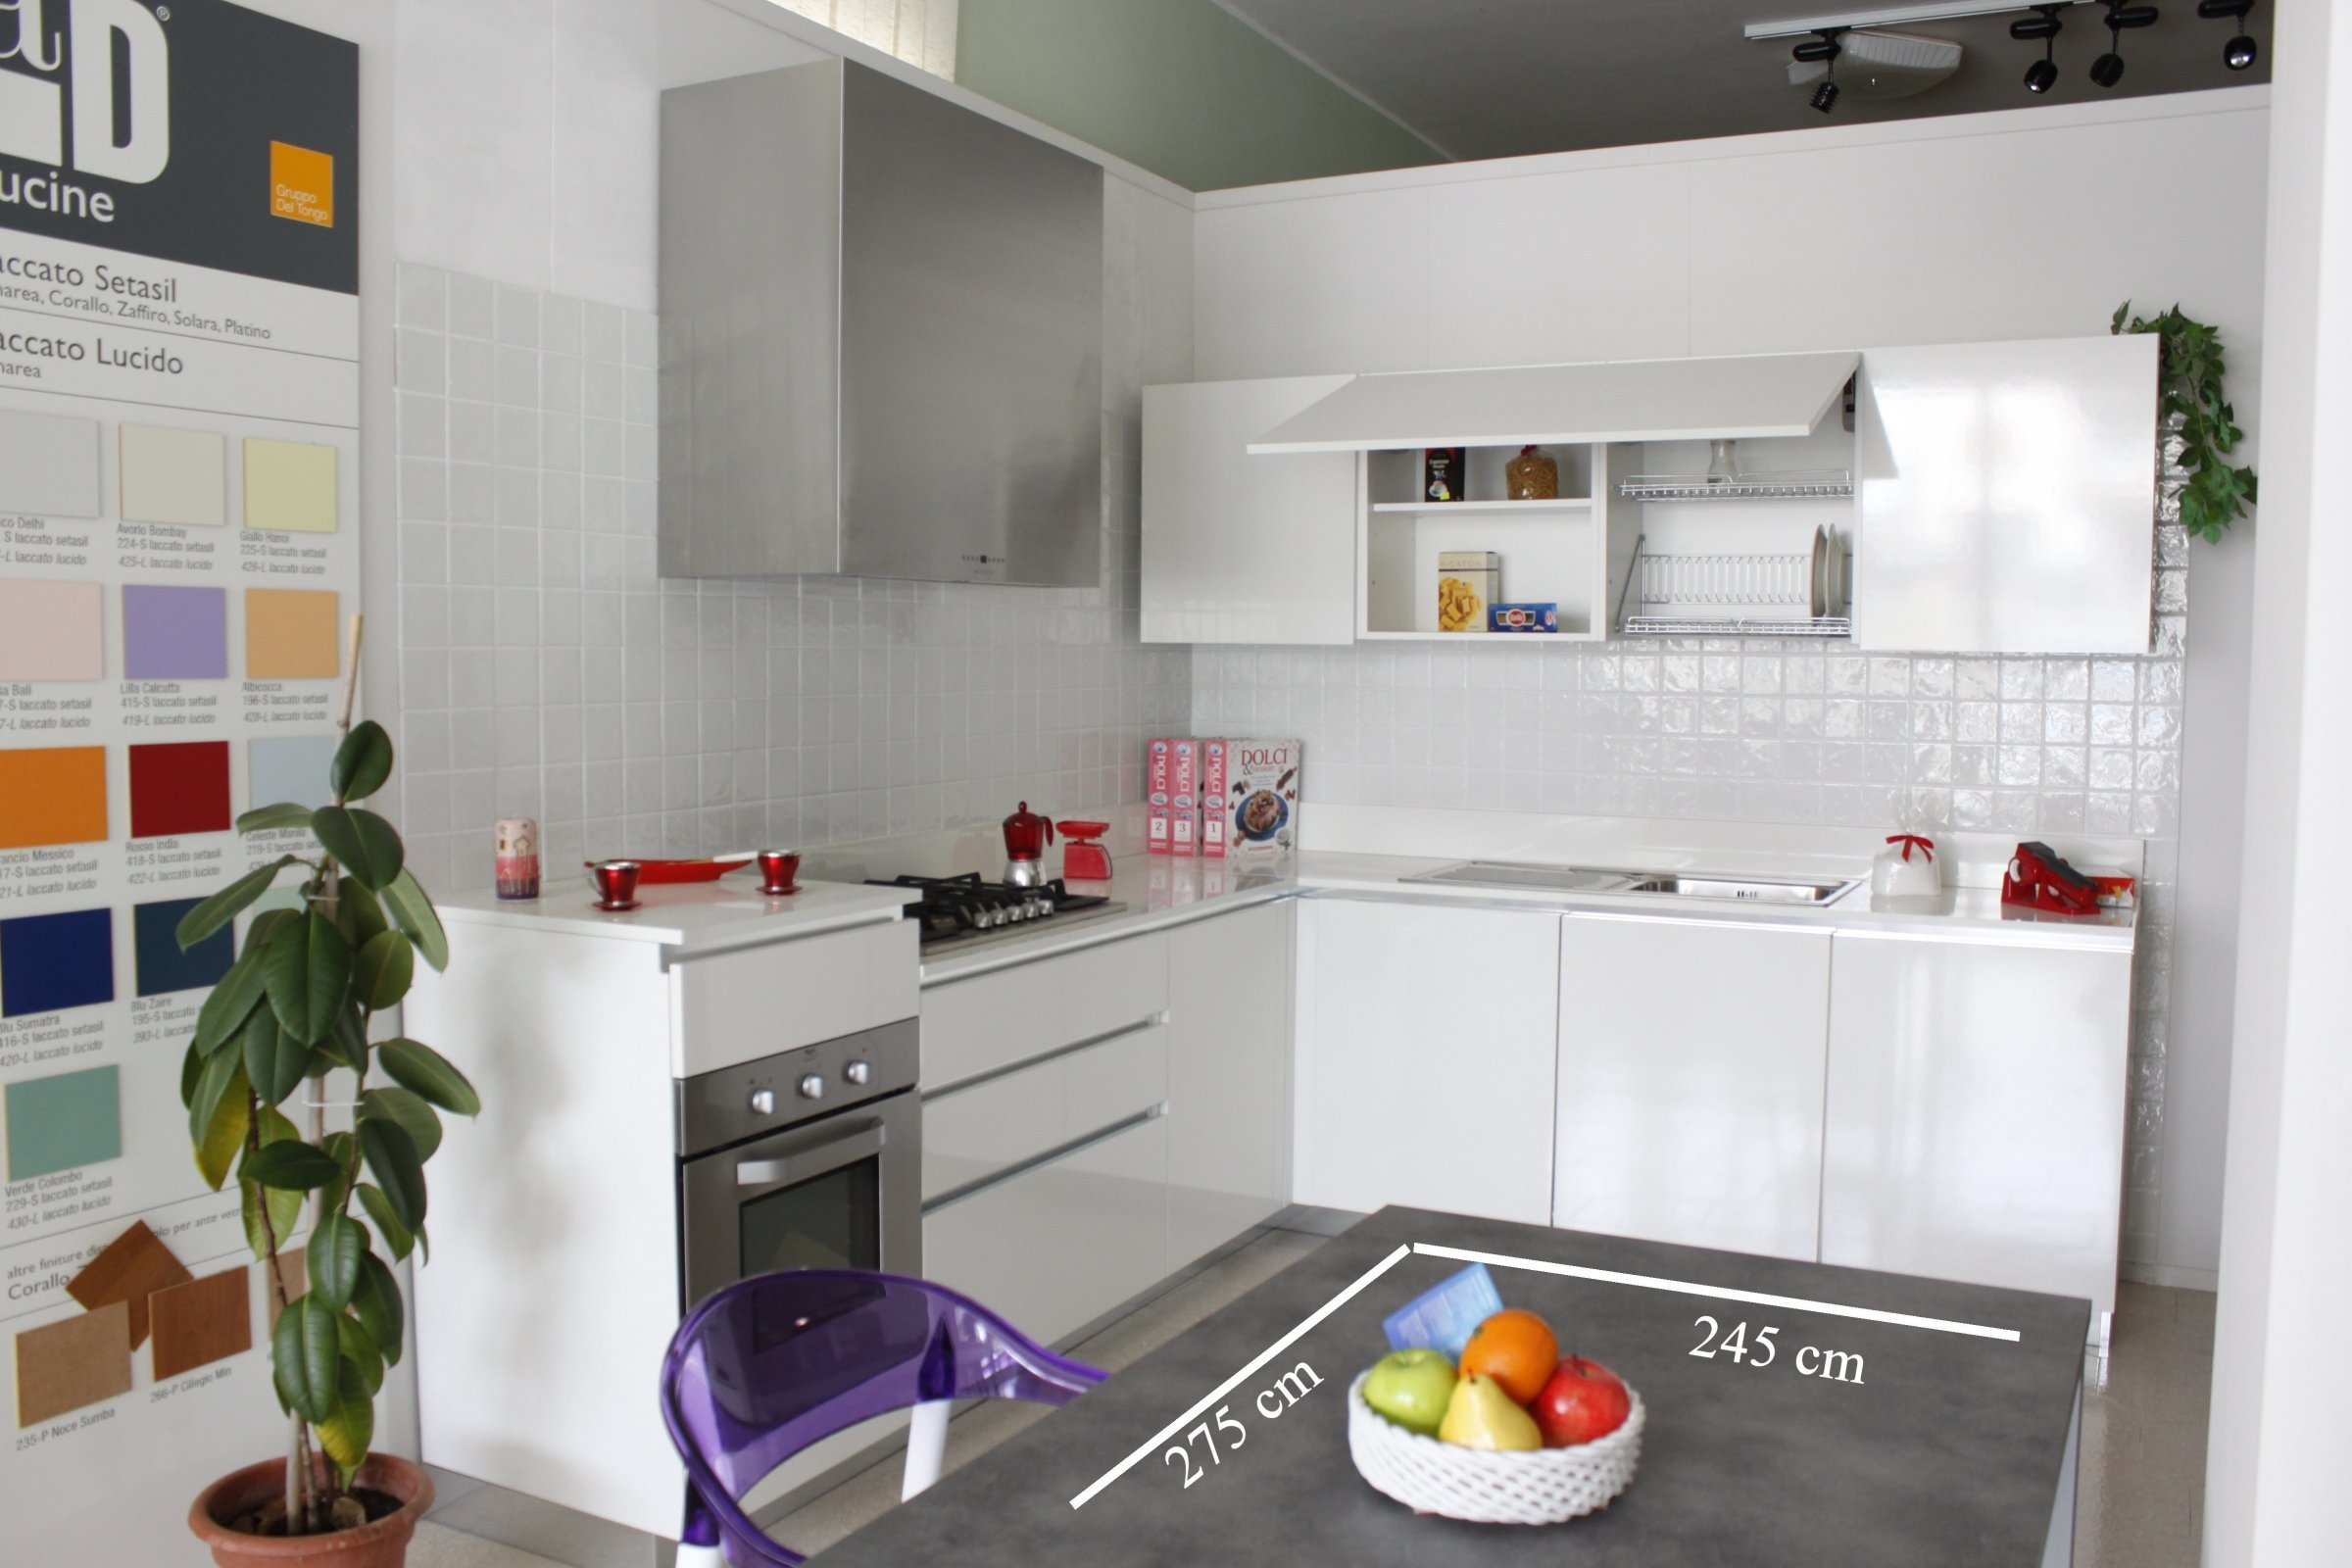 Cucina modello creta bianco astoria lucido marca del tongo ad cucine - Del tongo cucina ...